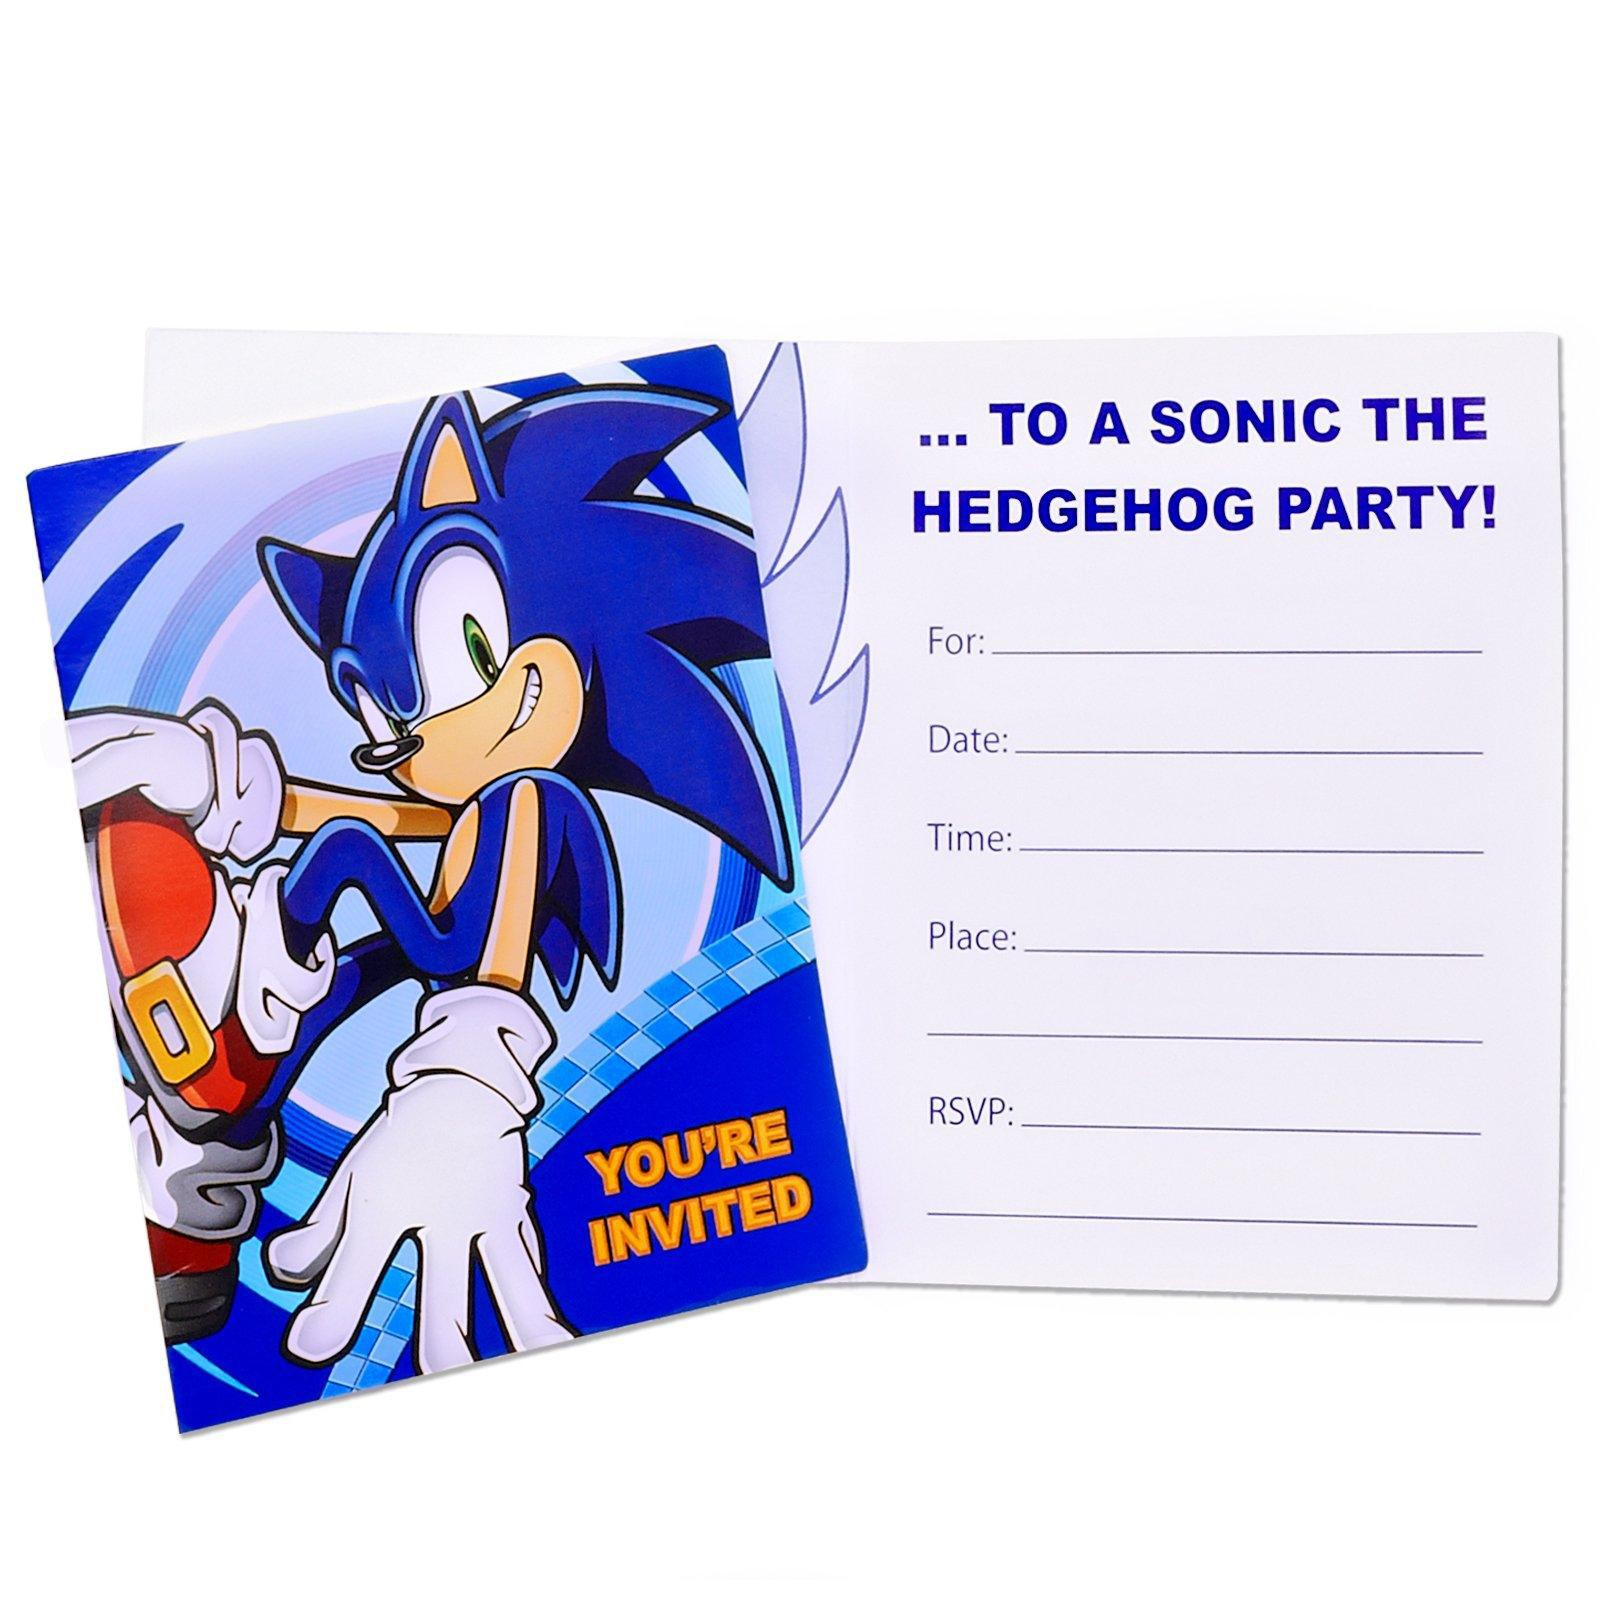 Sonic the Hedgehog Invitations | BirthdayExpress.com